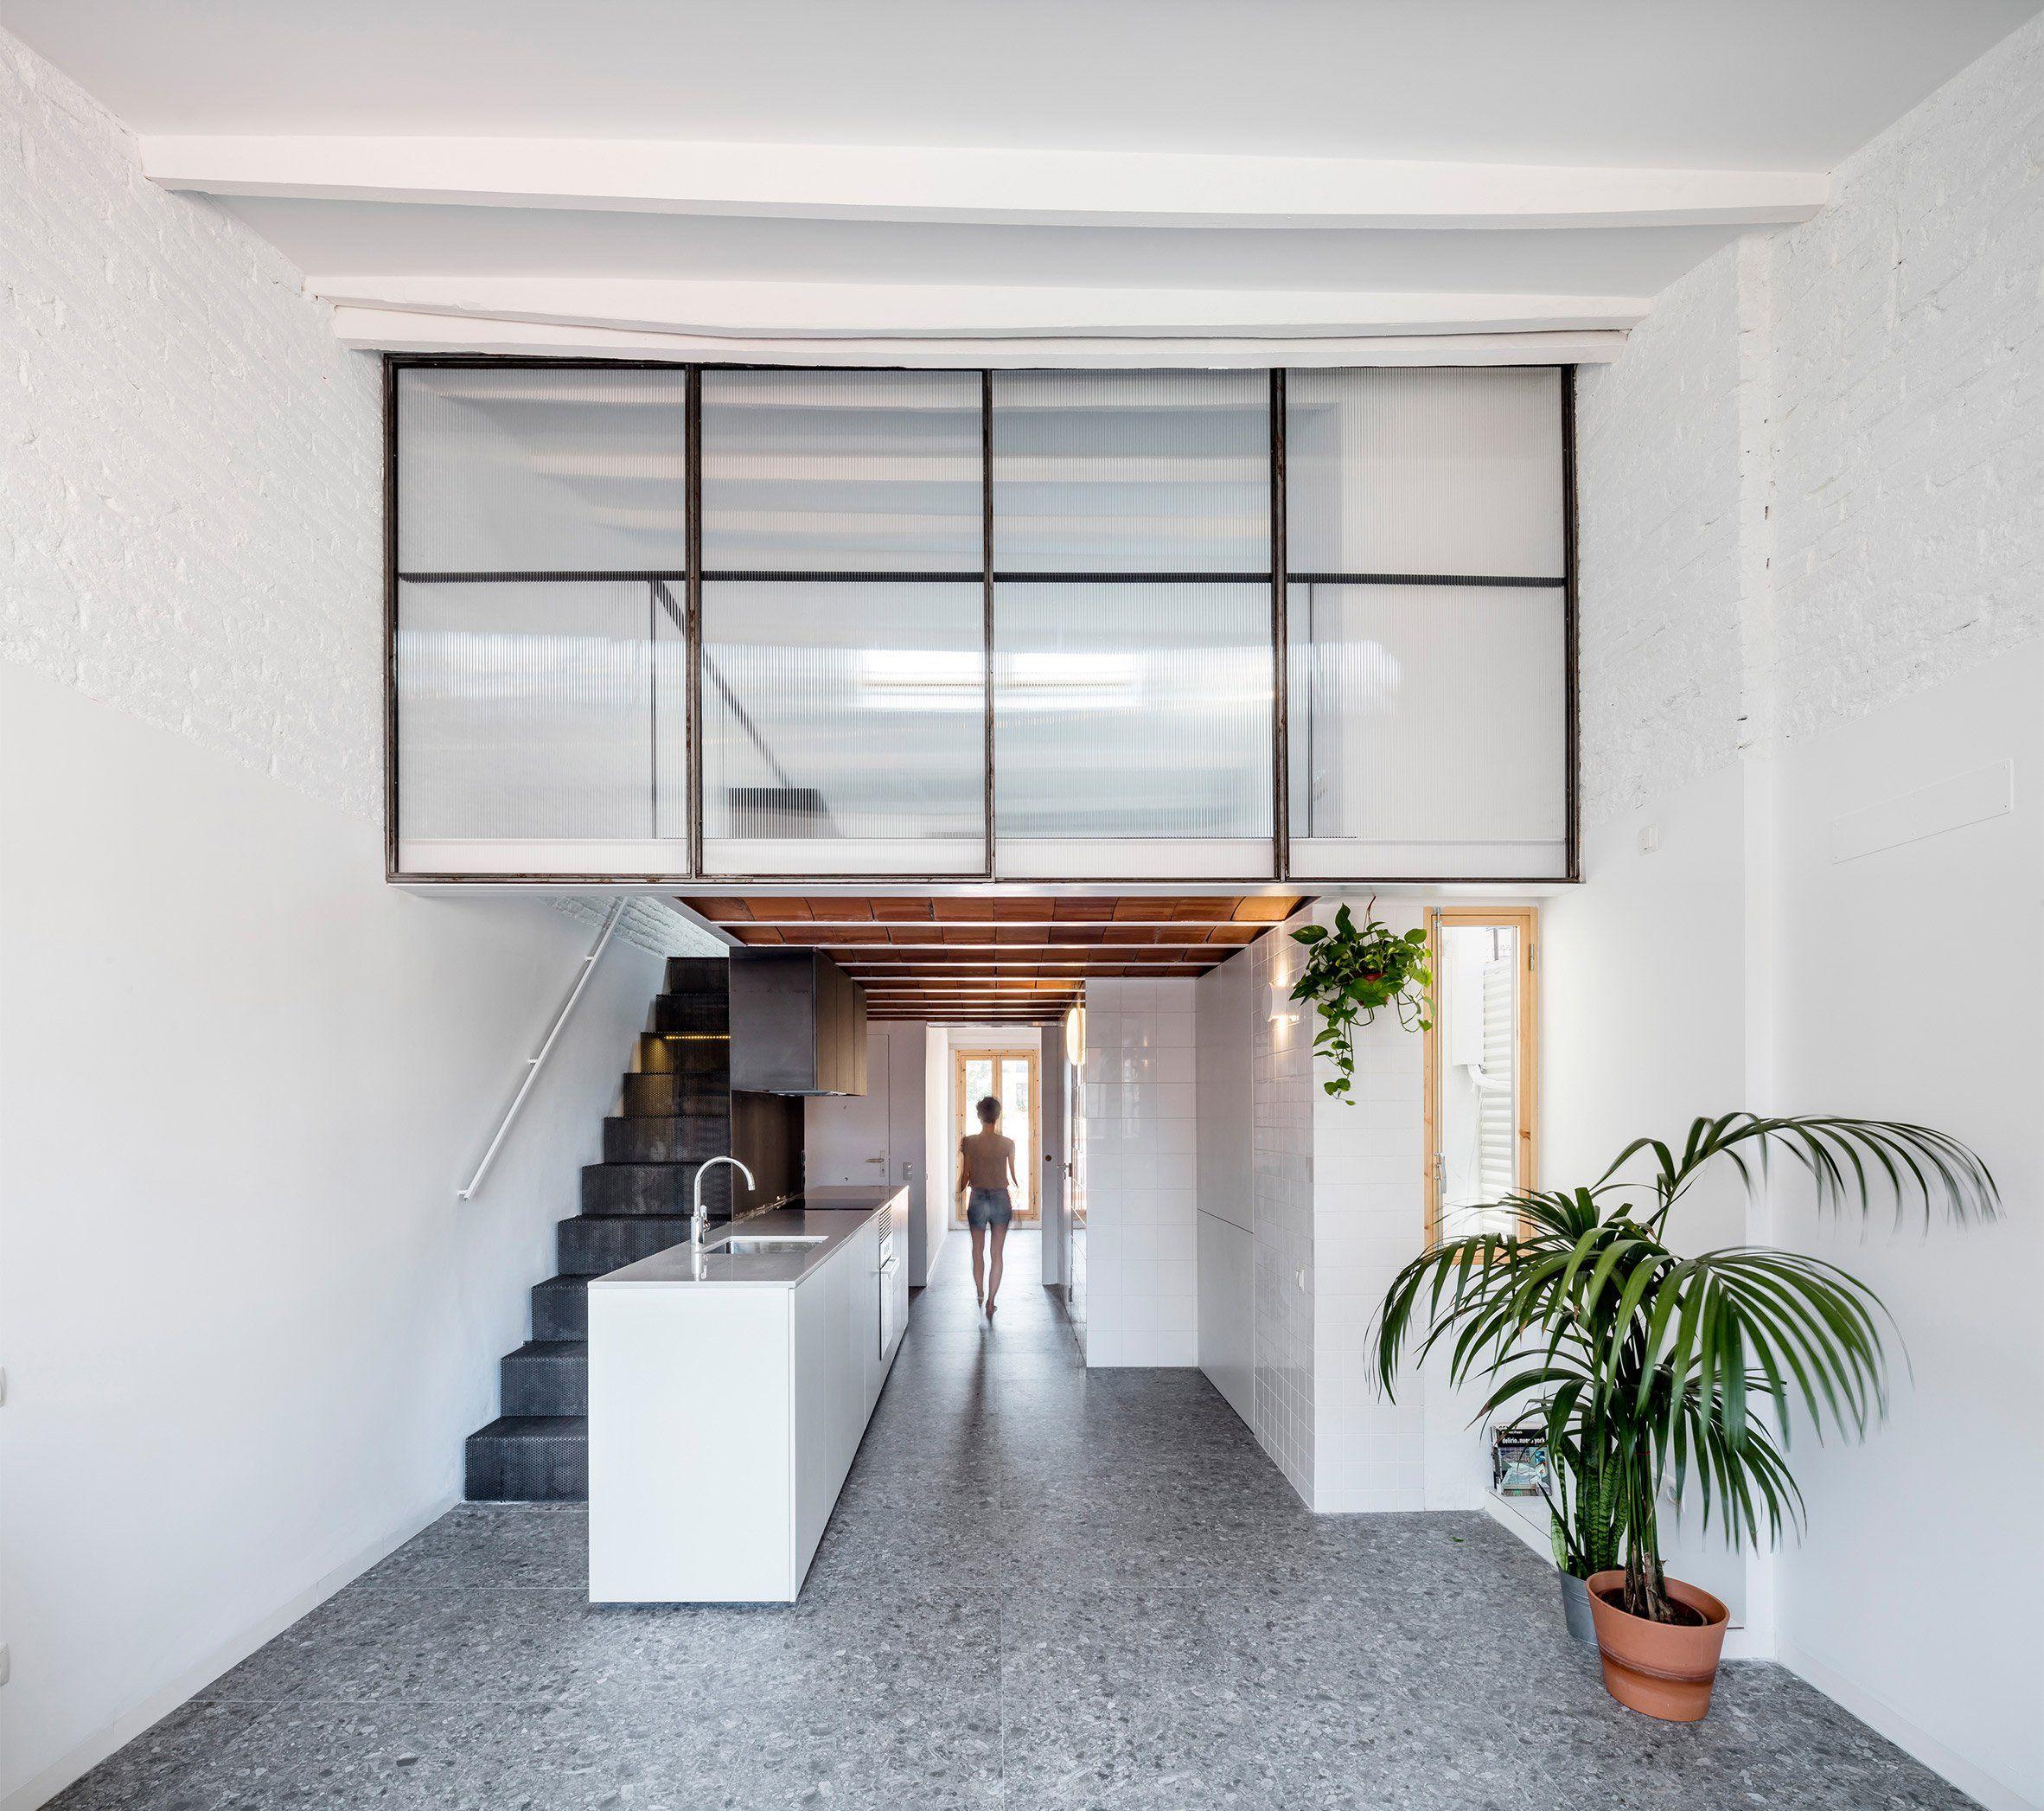 Ras Studio has overhauled a loft apartment in Barcelona creating a